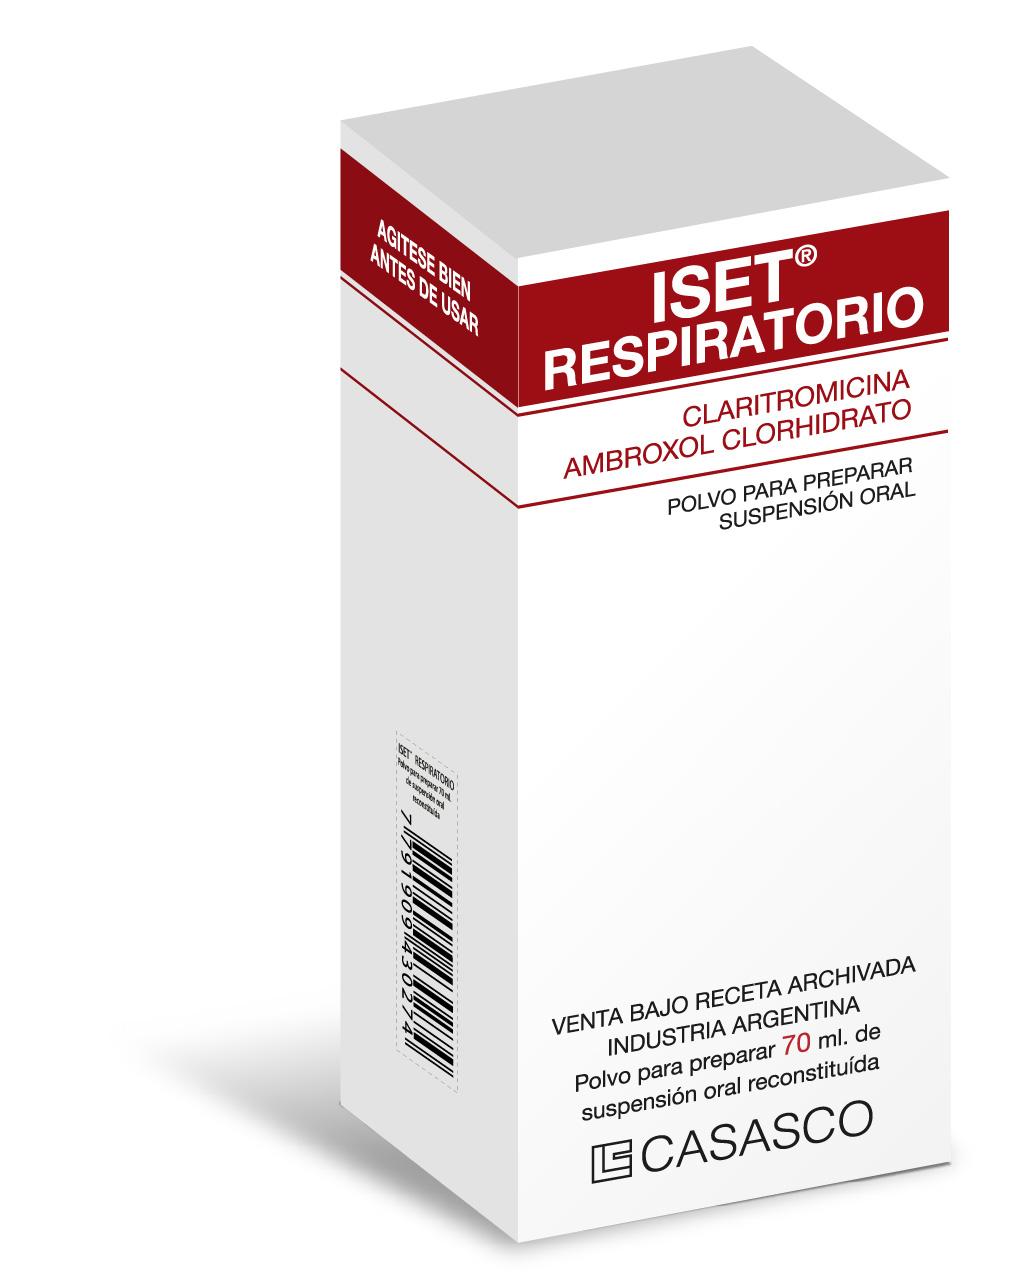 Iset Respiratorio Laboratorios Casasco